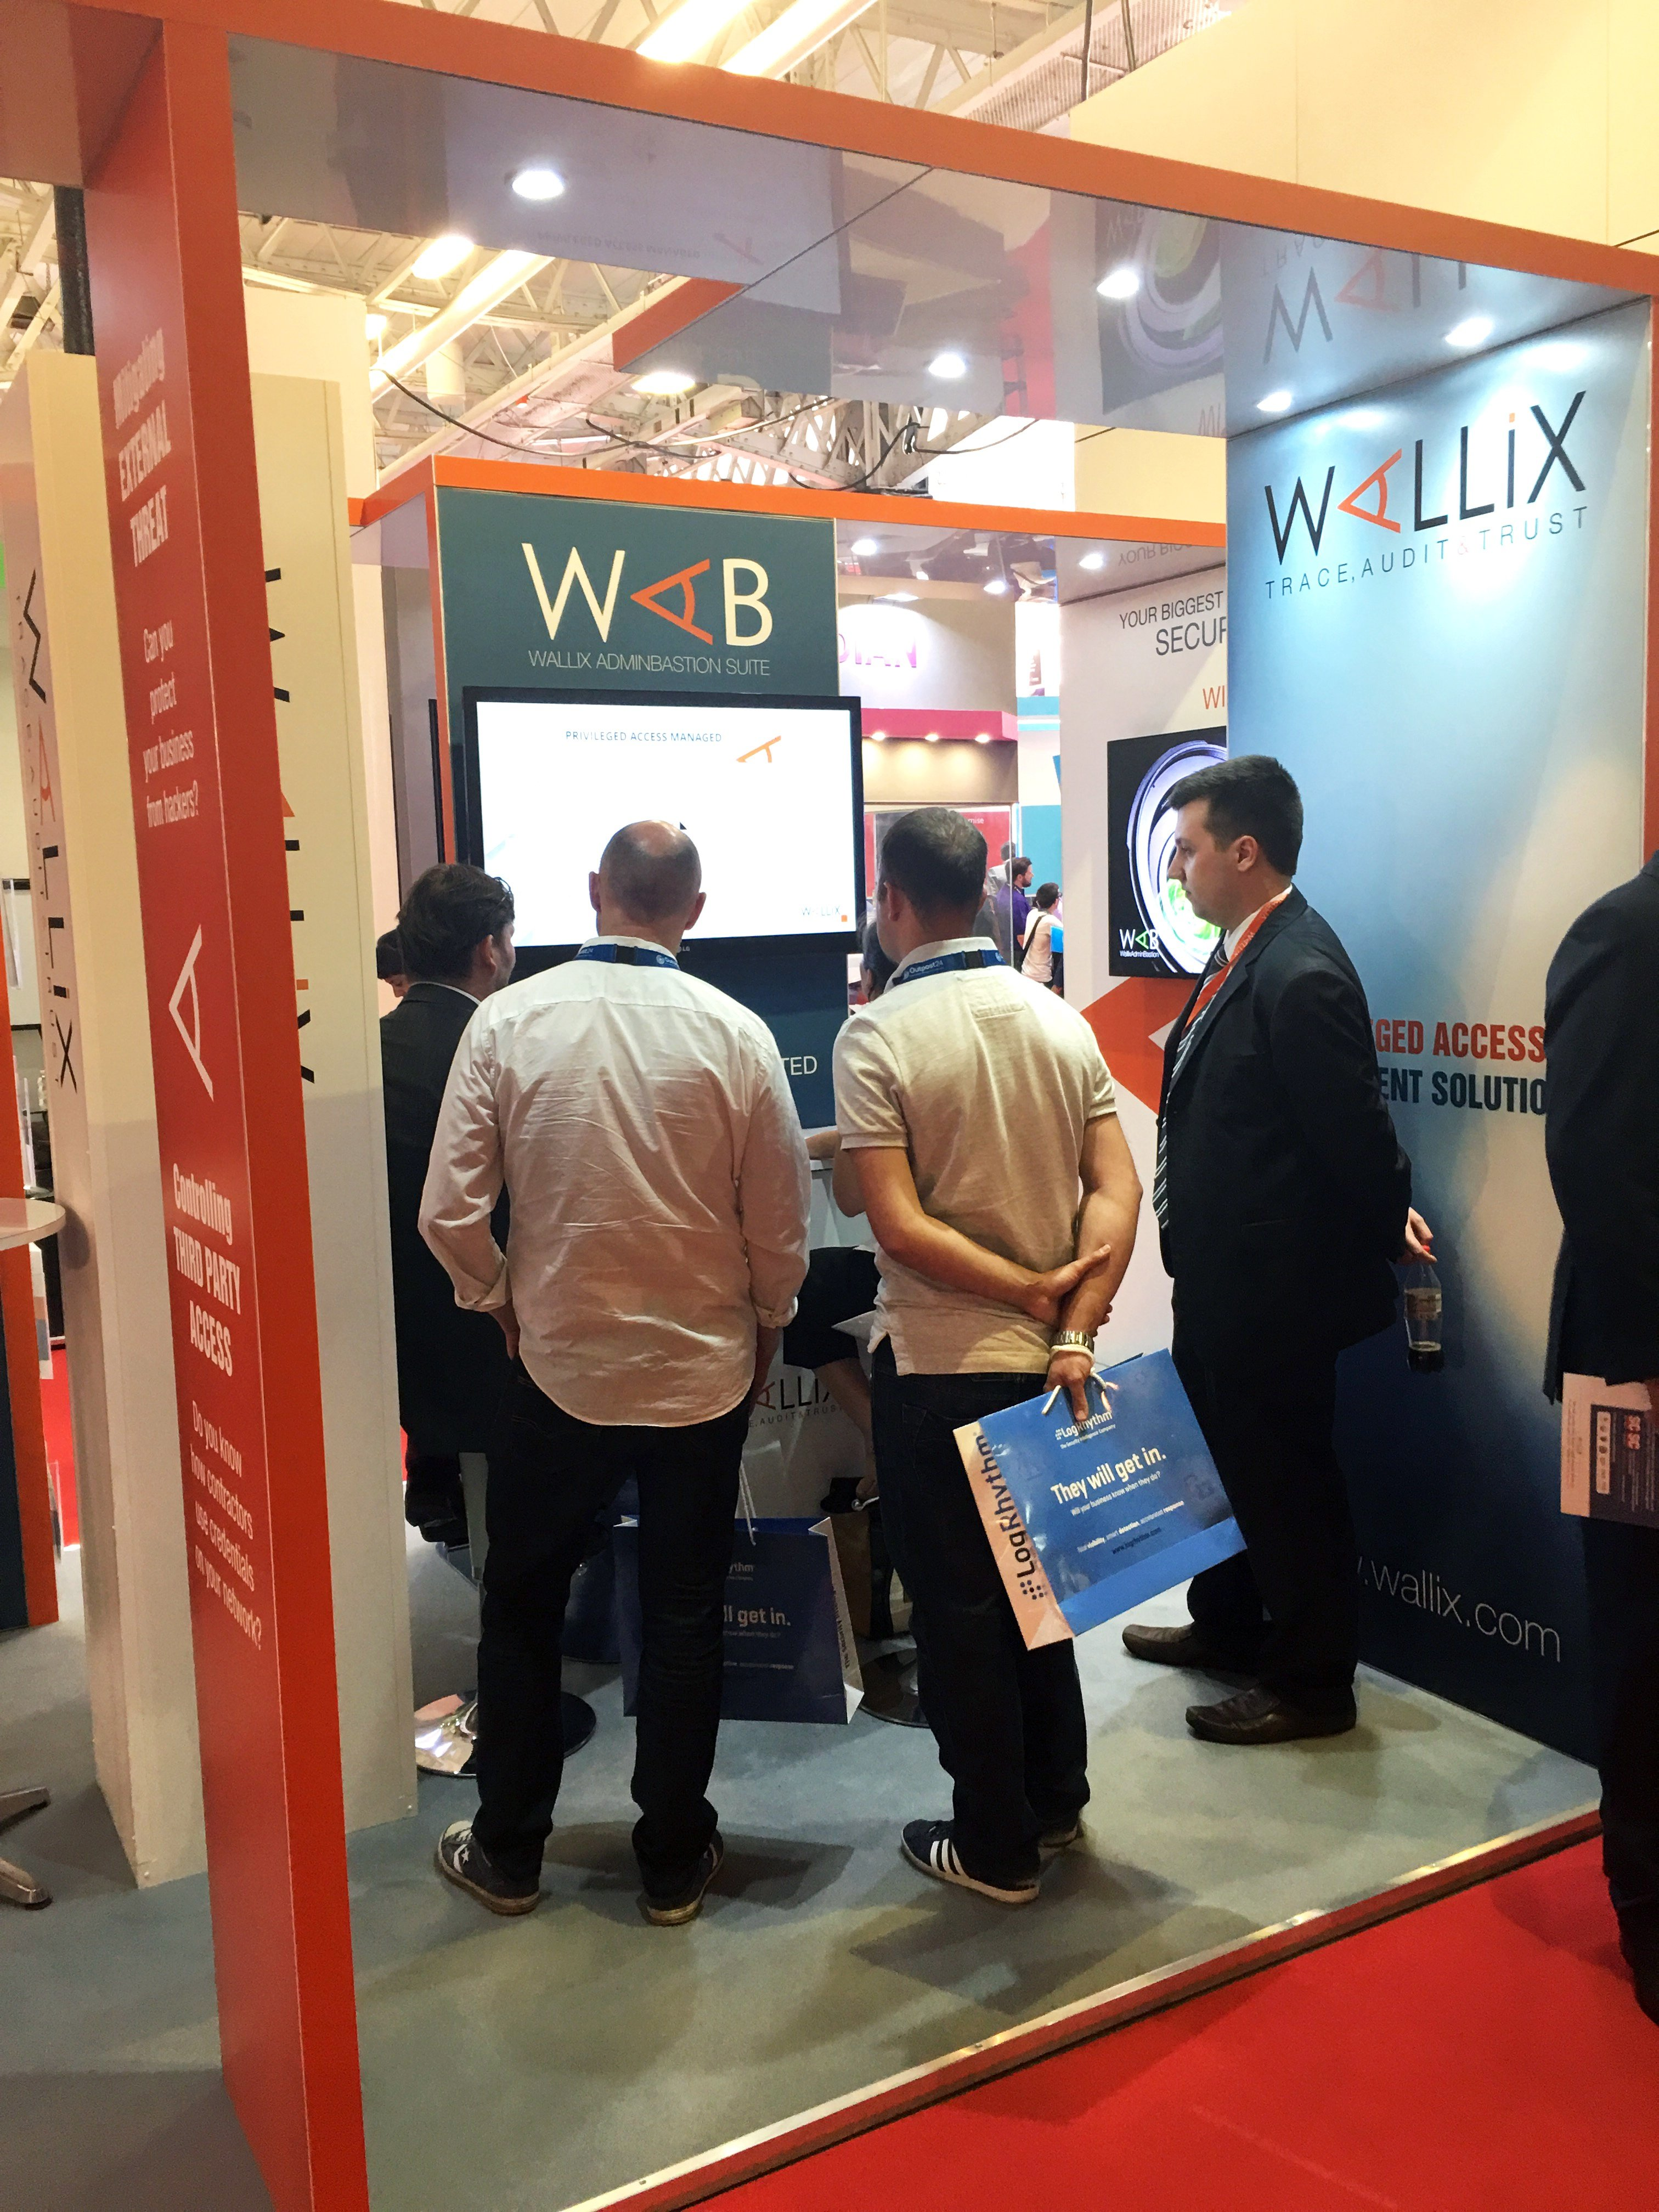 info-sec-16-privileged-access-user-management-wallix-wab-suite.jpg